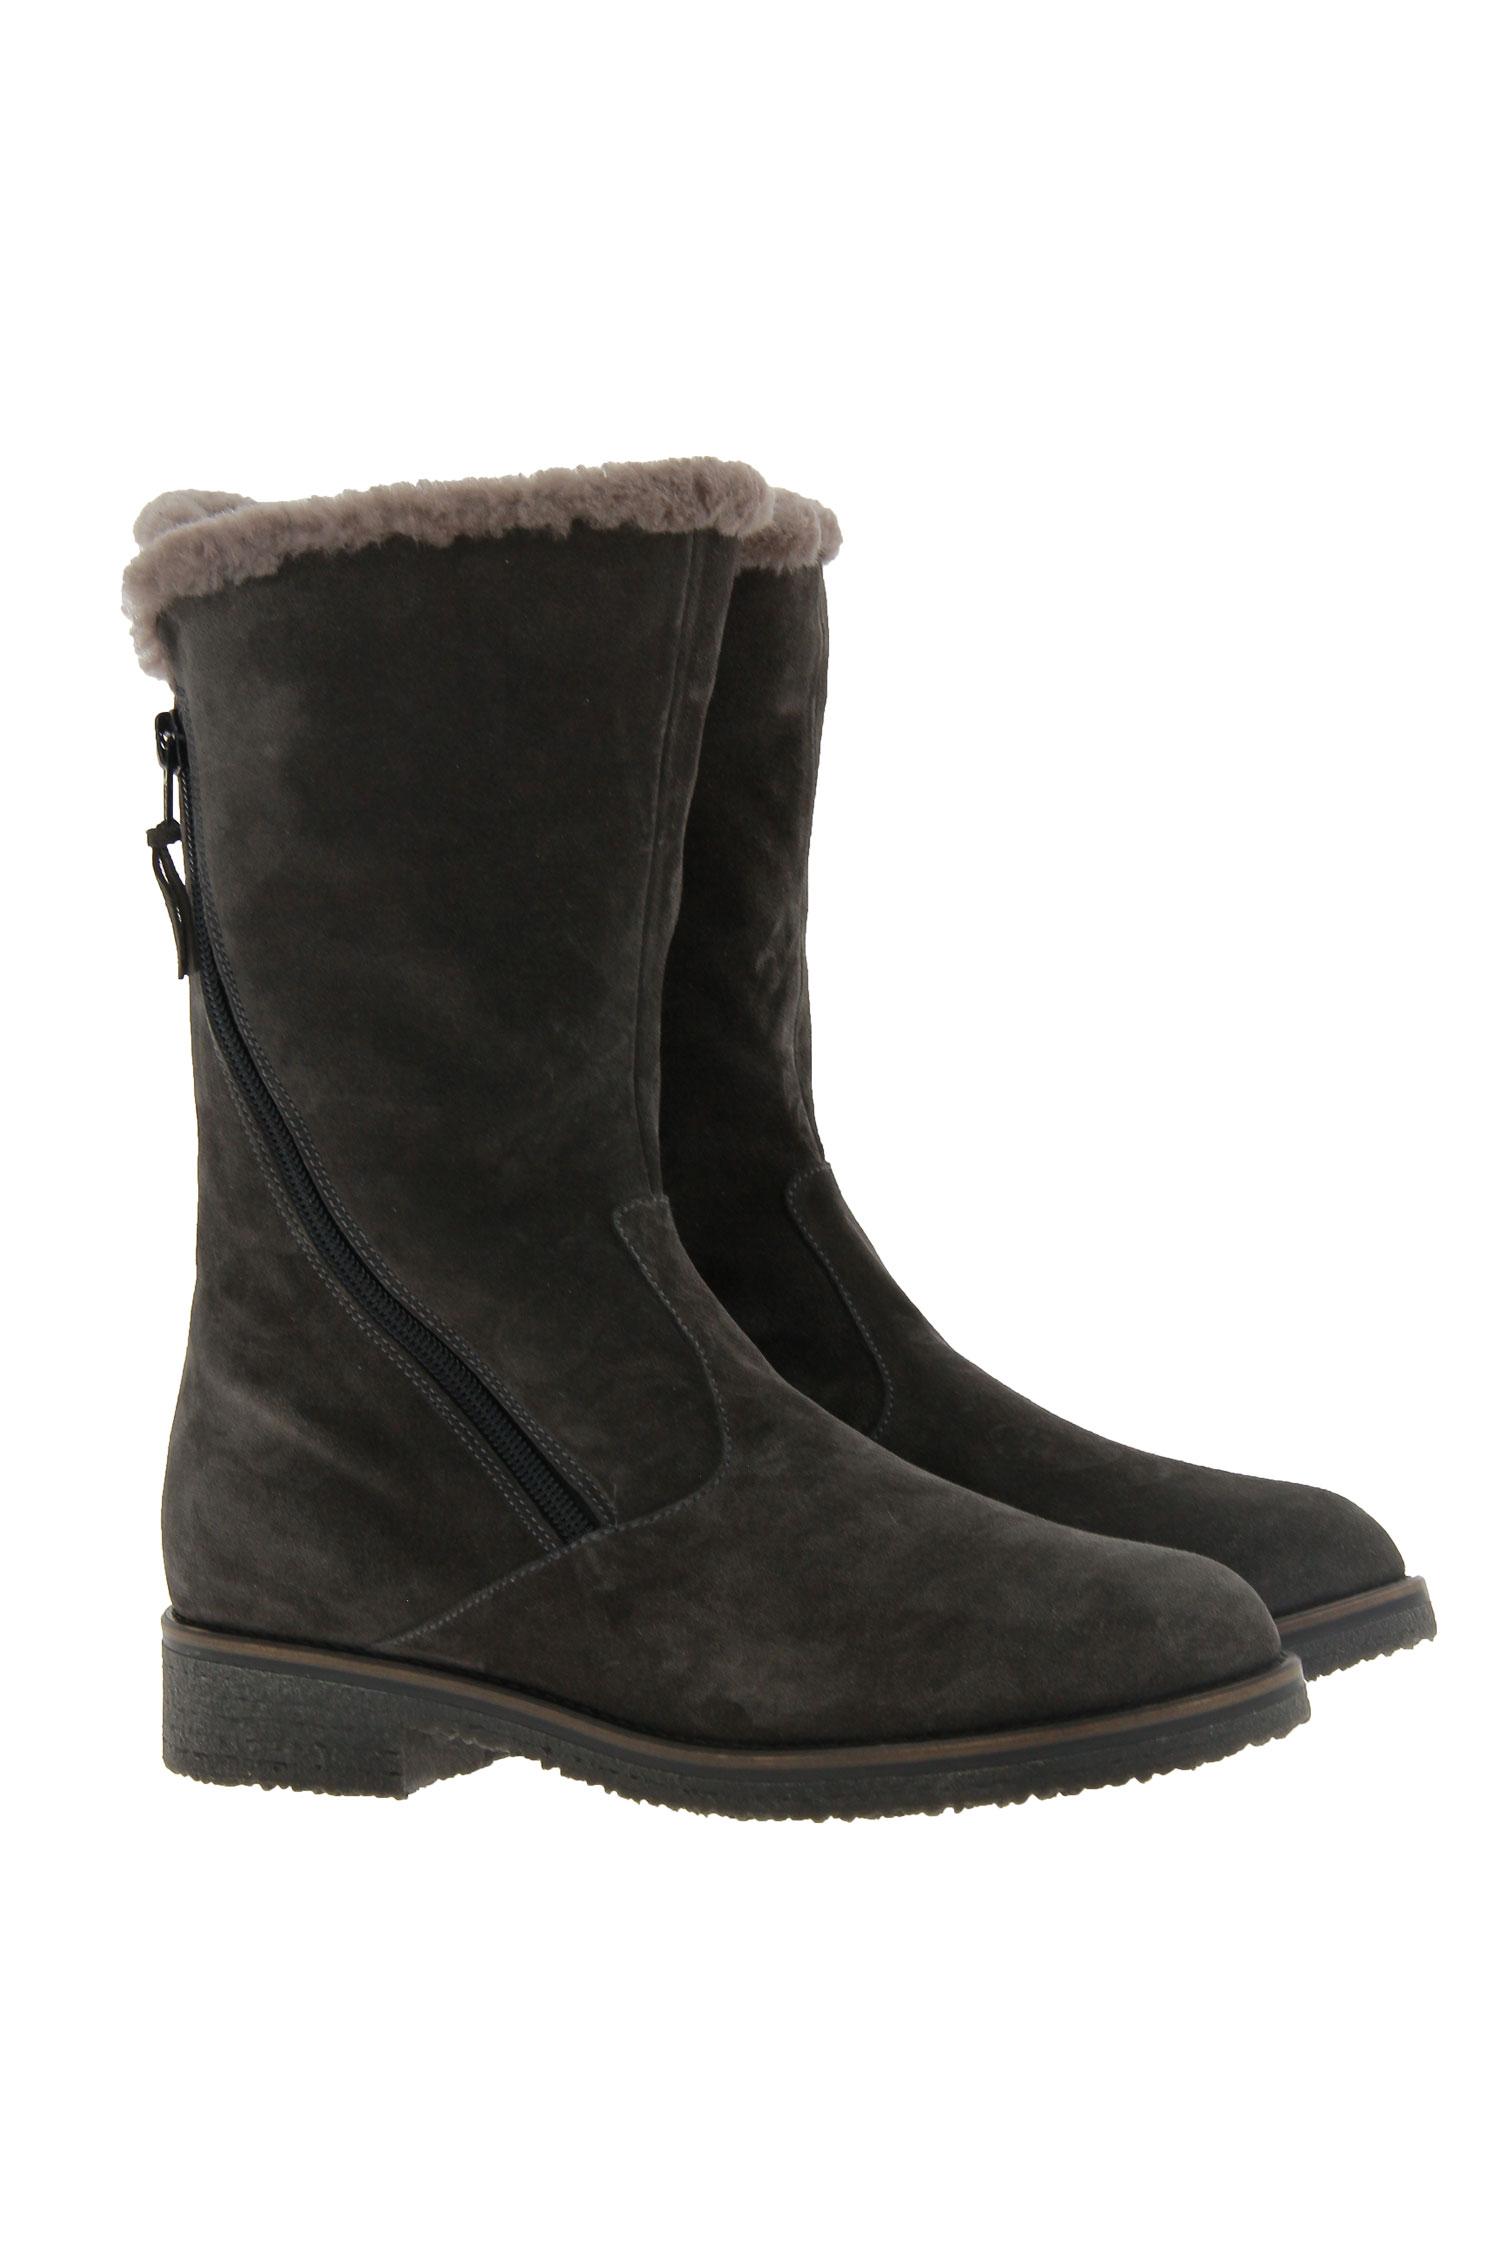 Baldan ankle boots lined VELOUR BISTRO